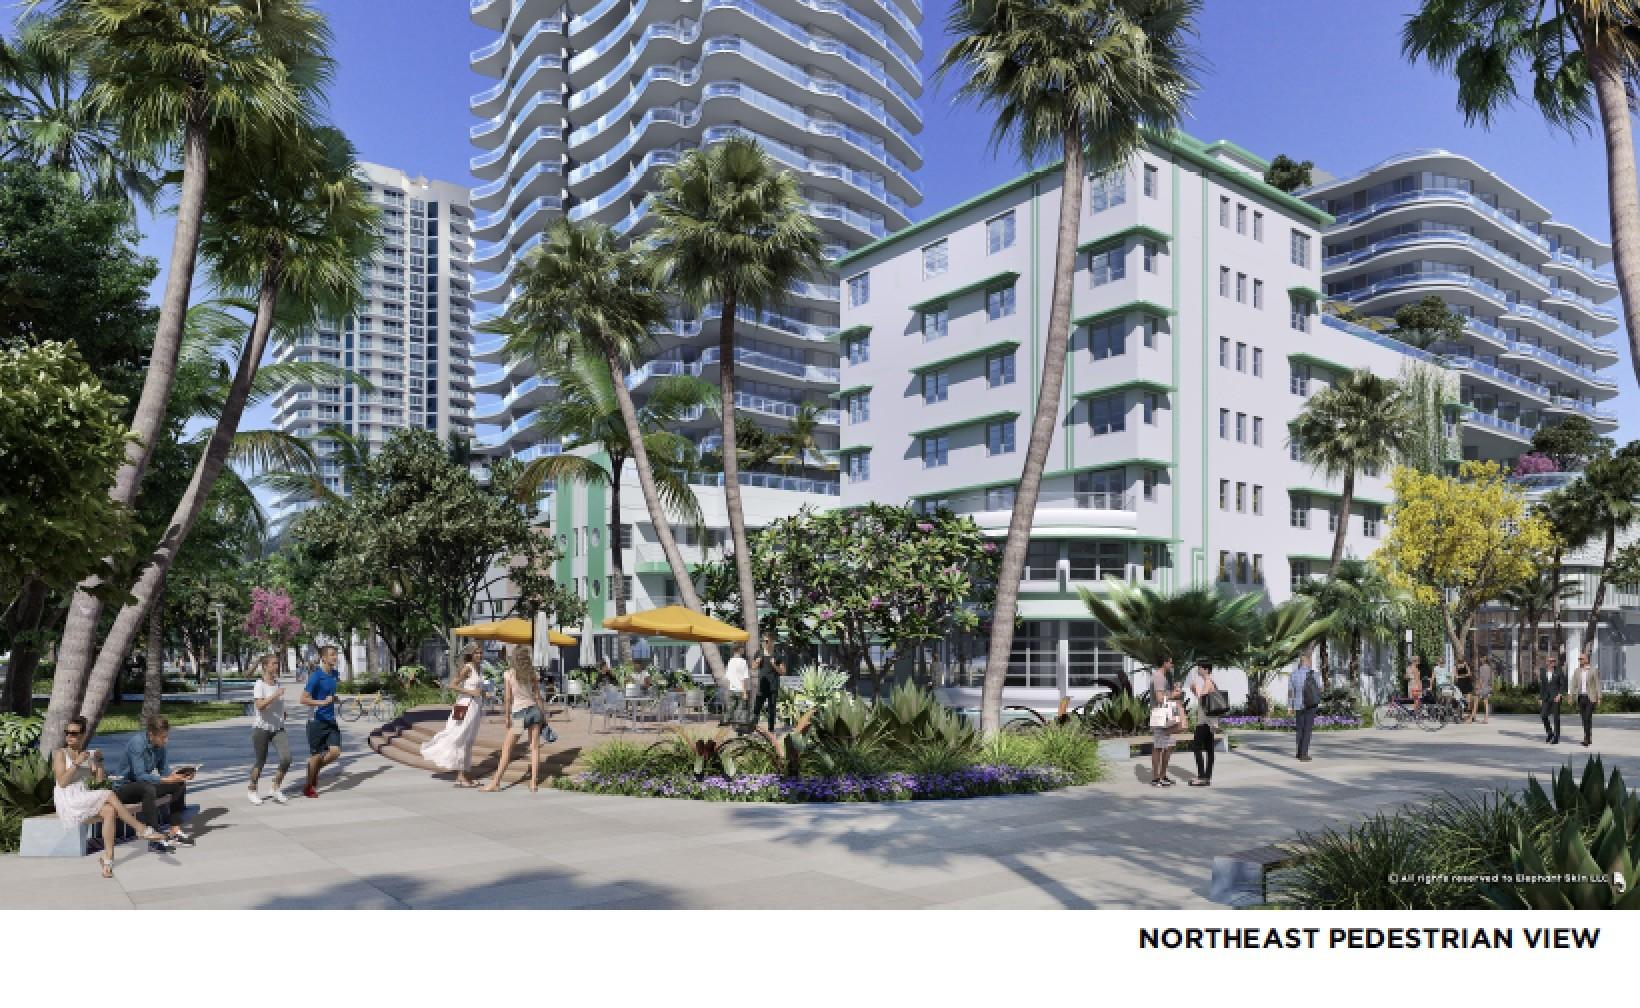 Northeast Pedestrian View of Ocean Terrace